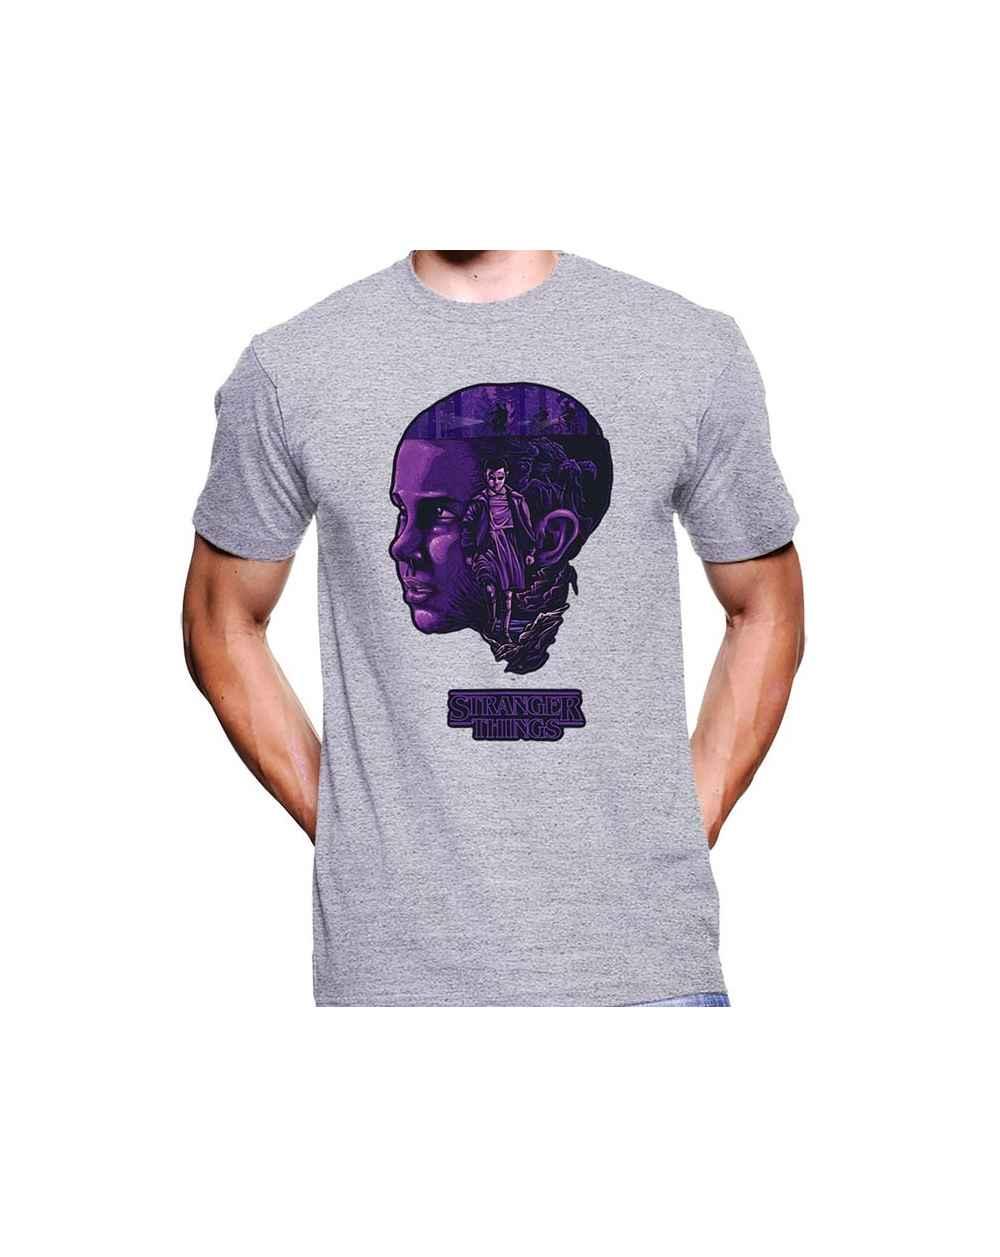 Camiseta Estampada Hombre Stranger Things 01